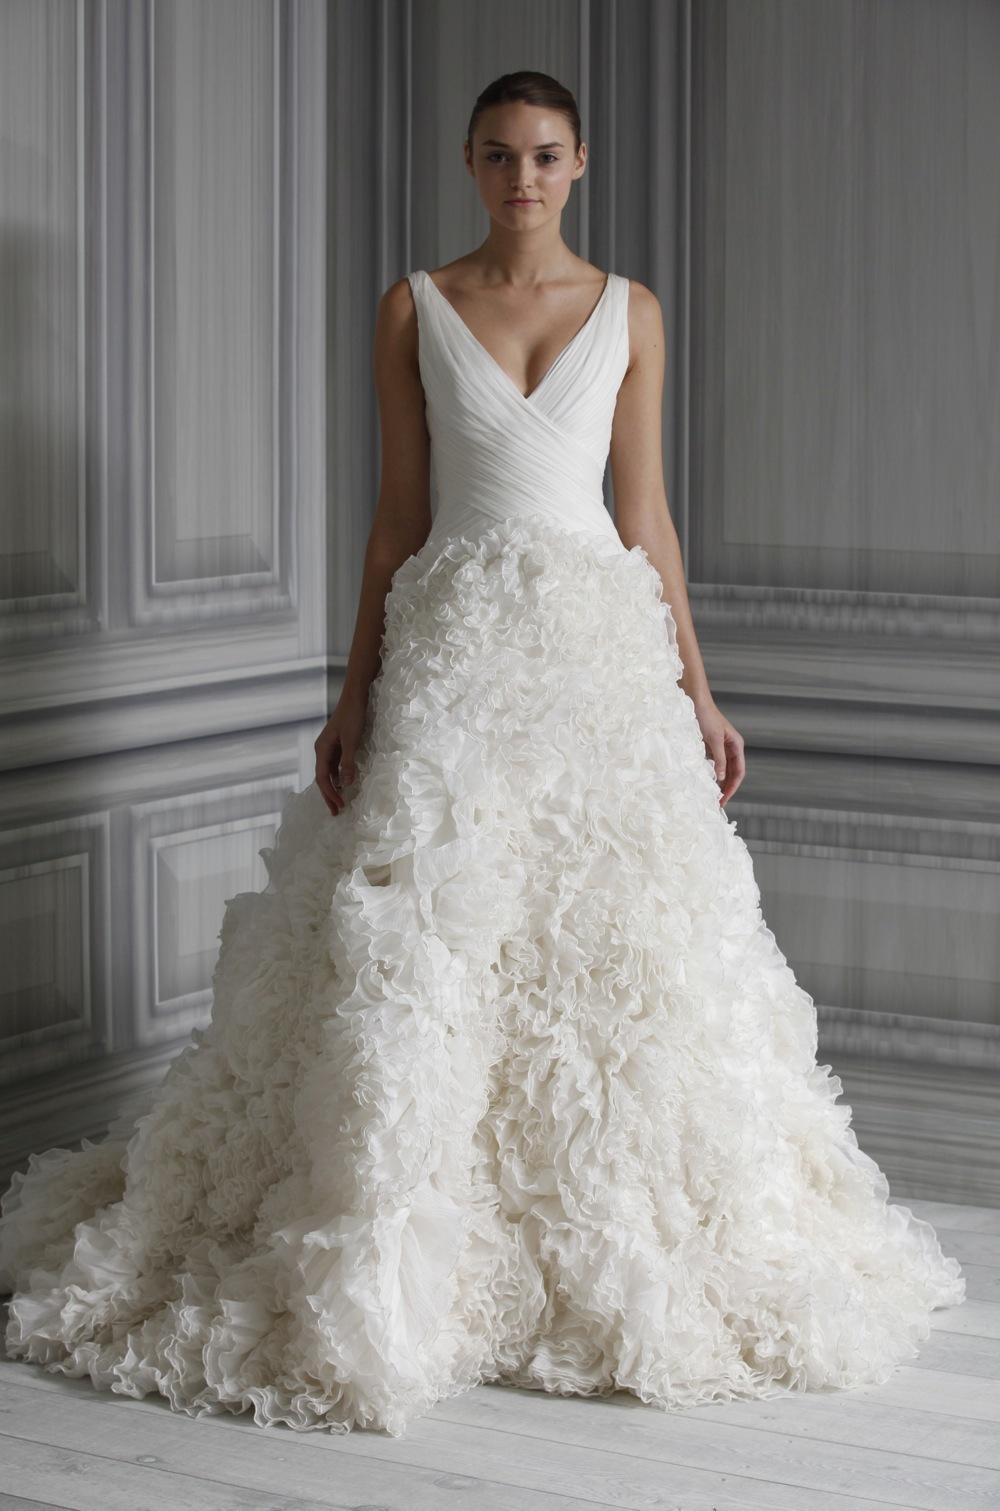 Wedding-dress-monique-lhuillier-bridal-gowns-spring-2012-legancy.full